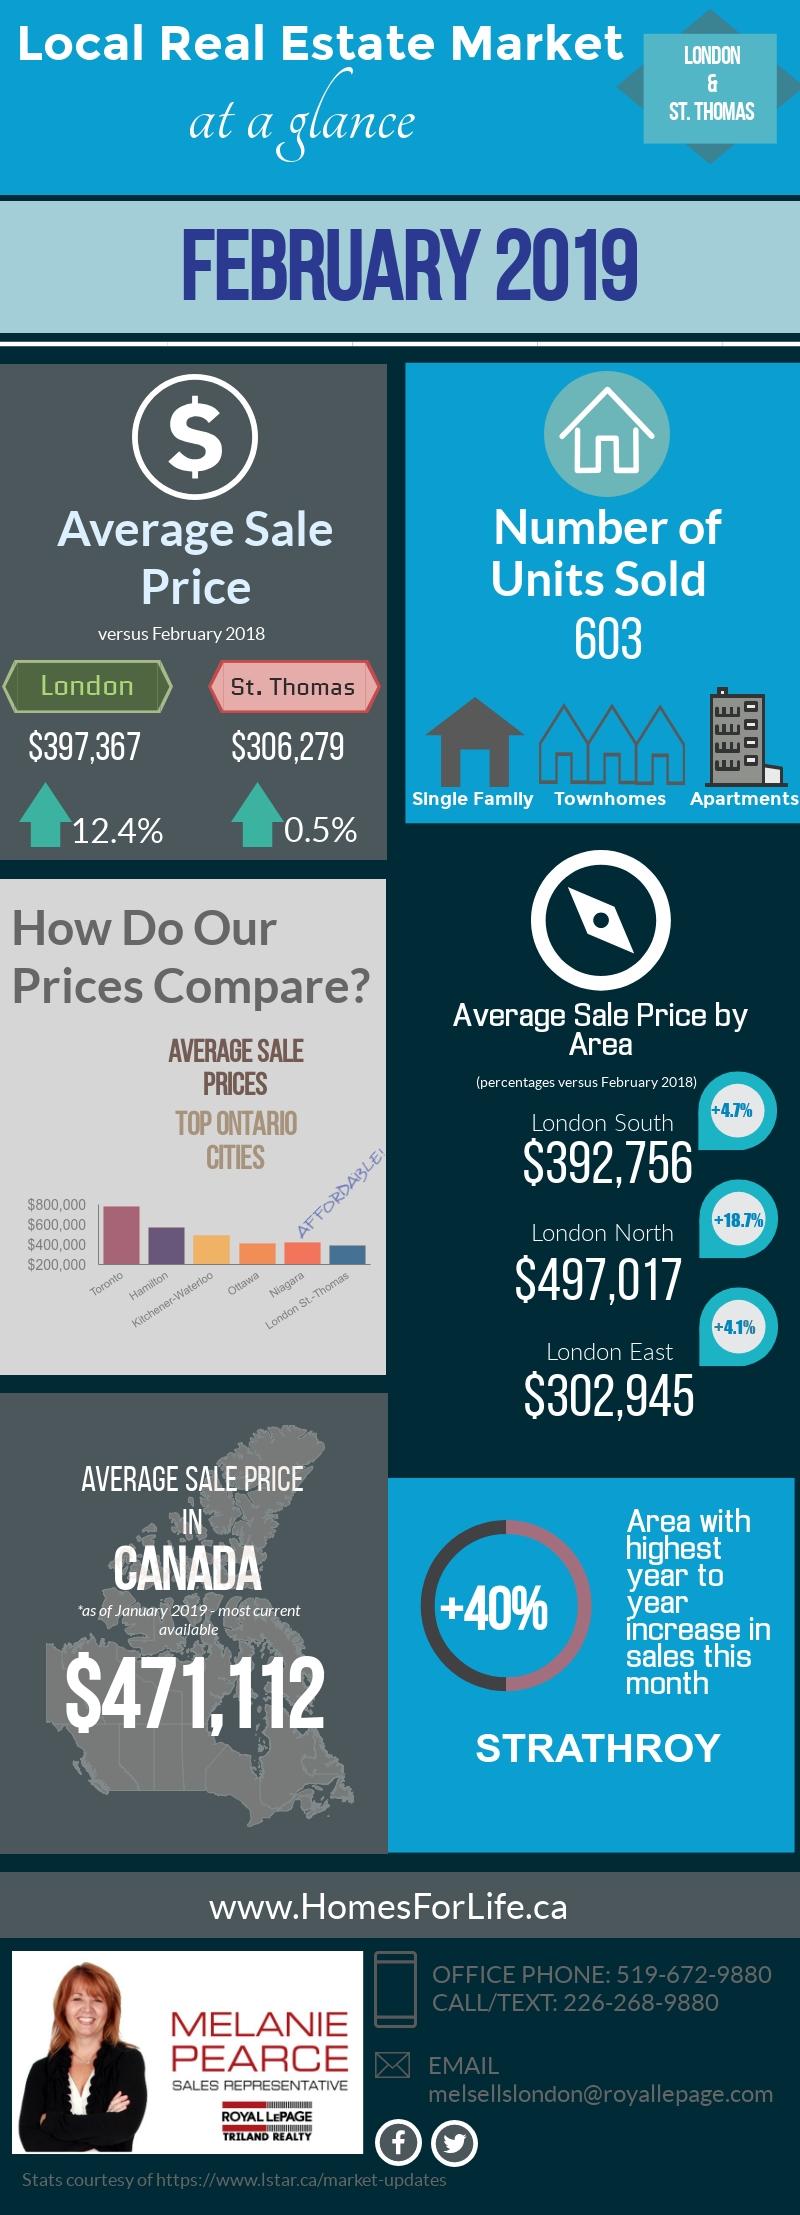 London-Ontario-Real-Estate-Market-Stats-February 2019.jpg